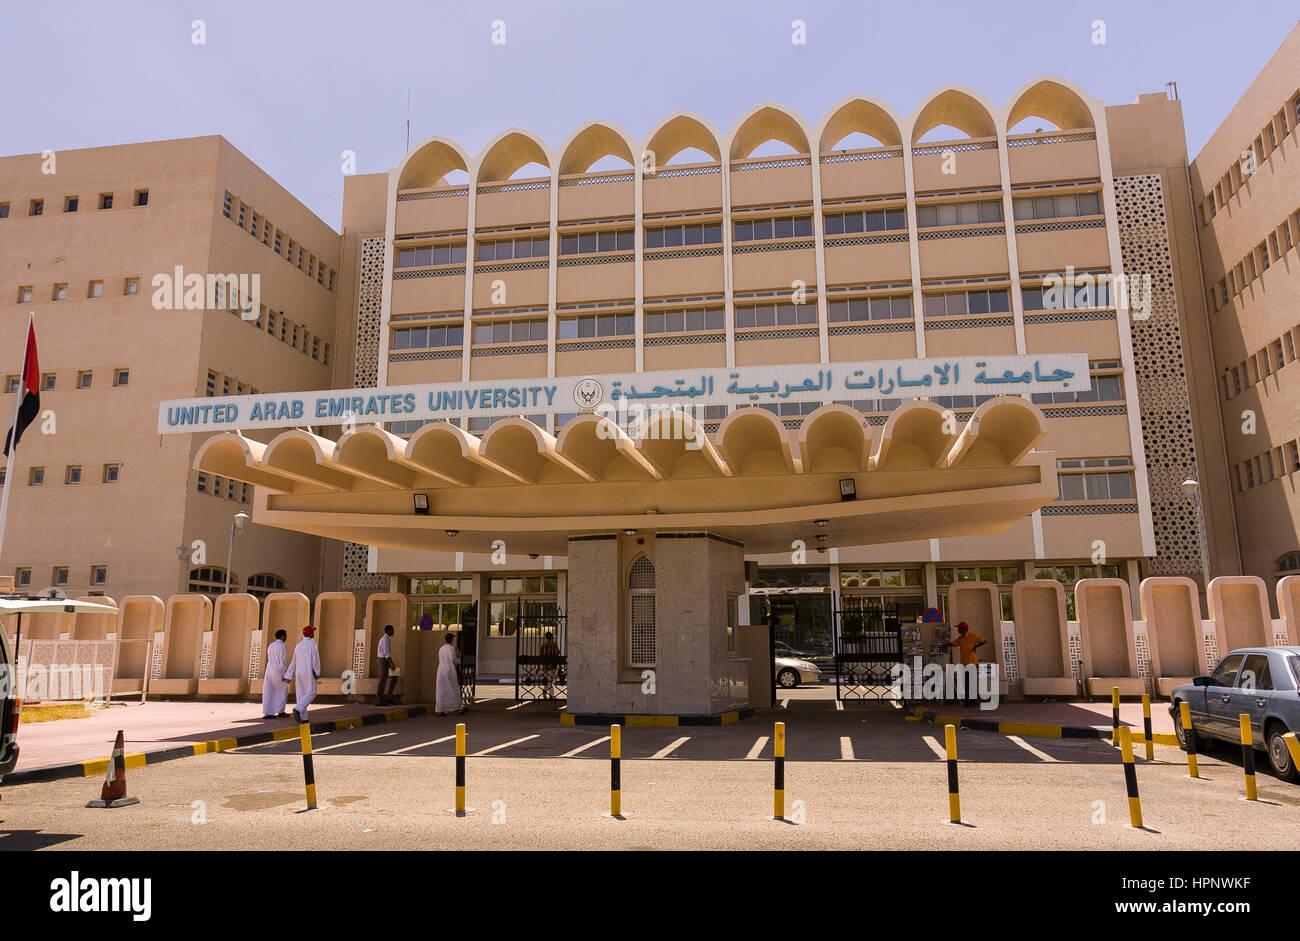 Al Ain United Arab Emirates Uae University Building Stock Photo Alamy